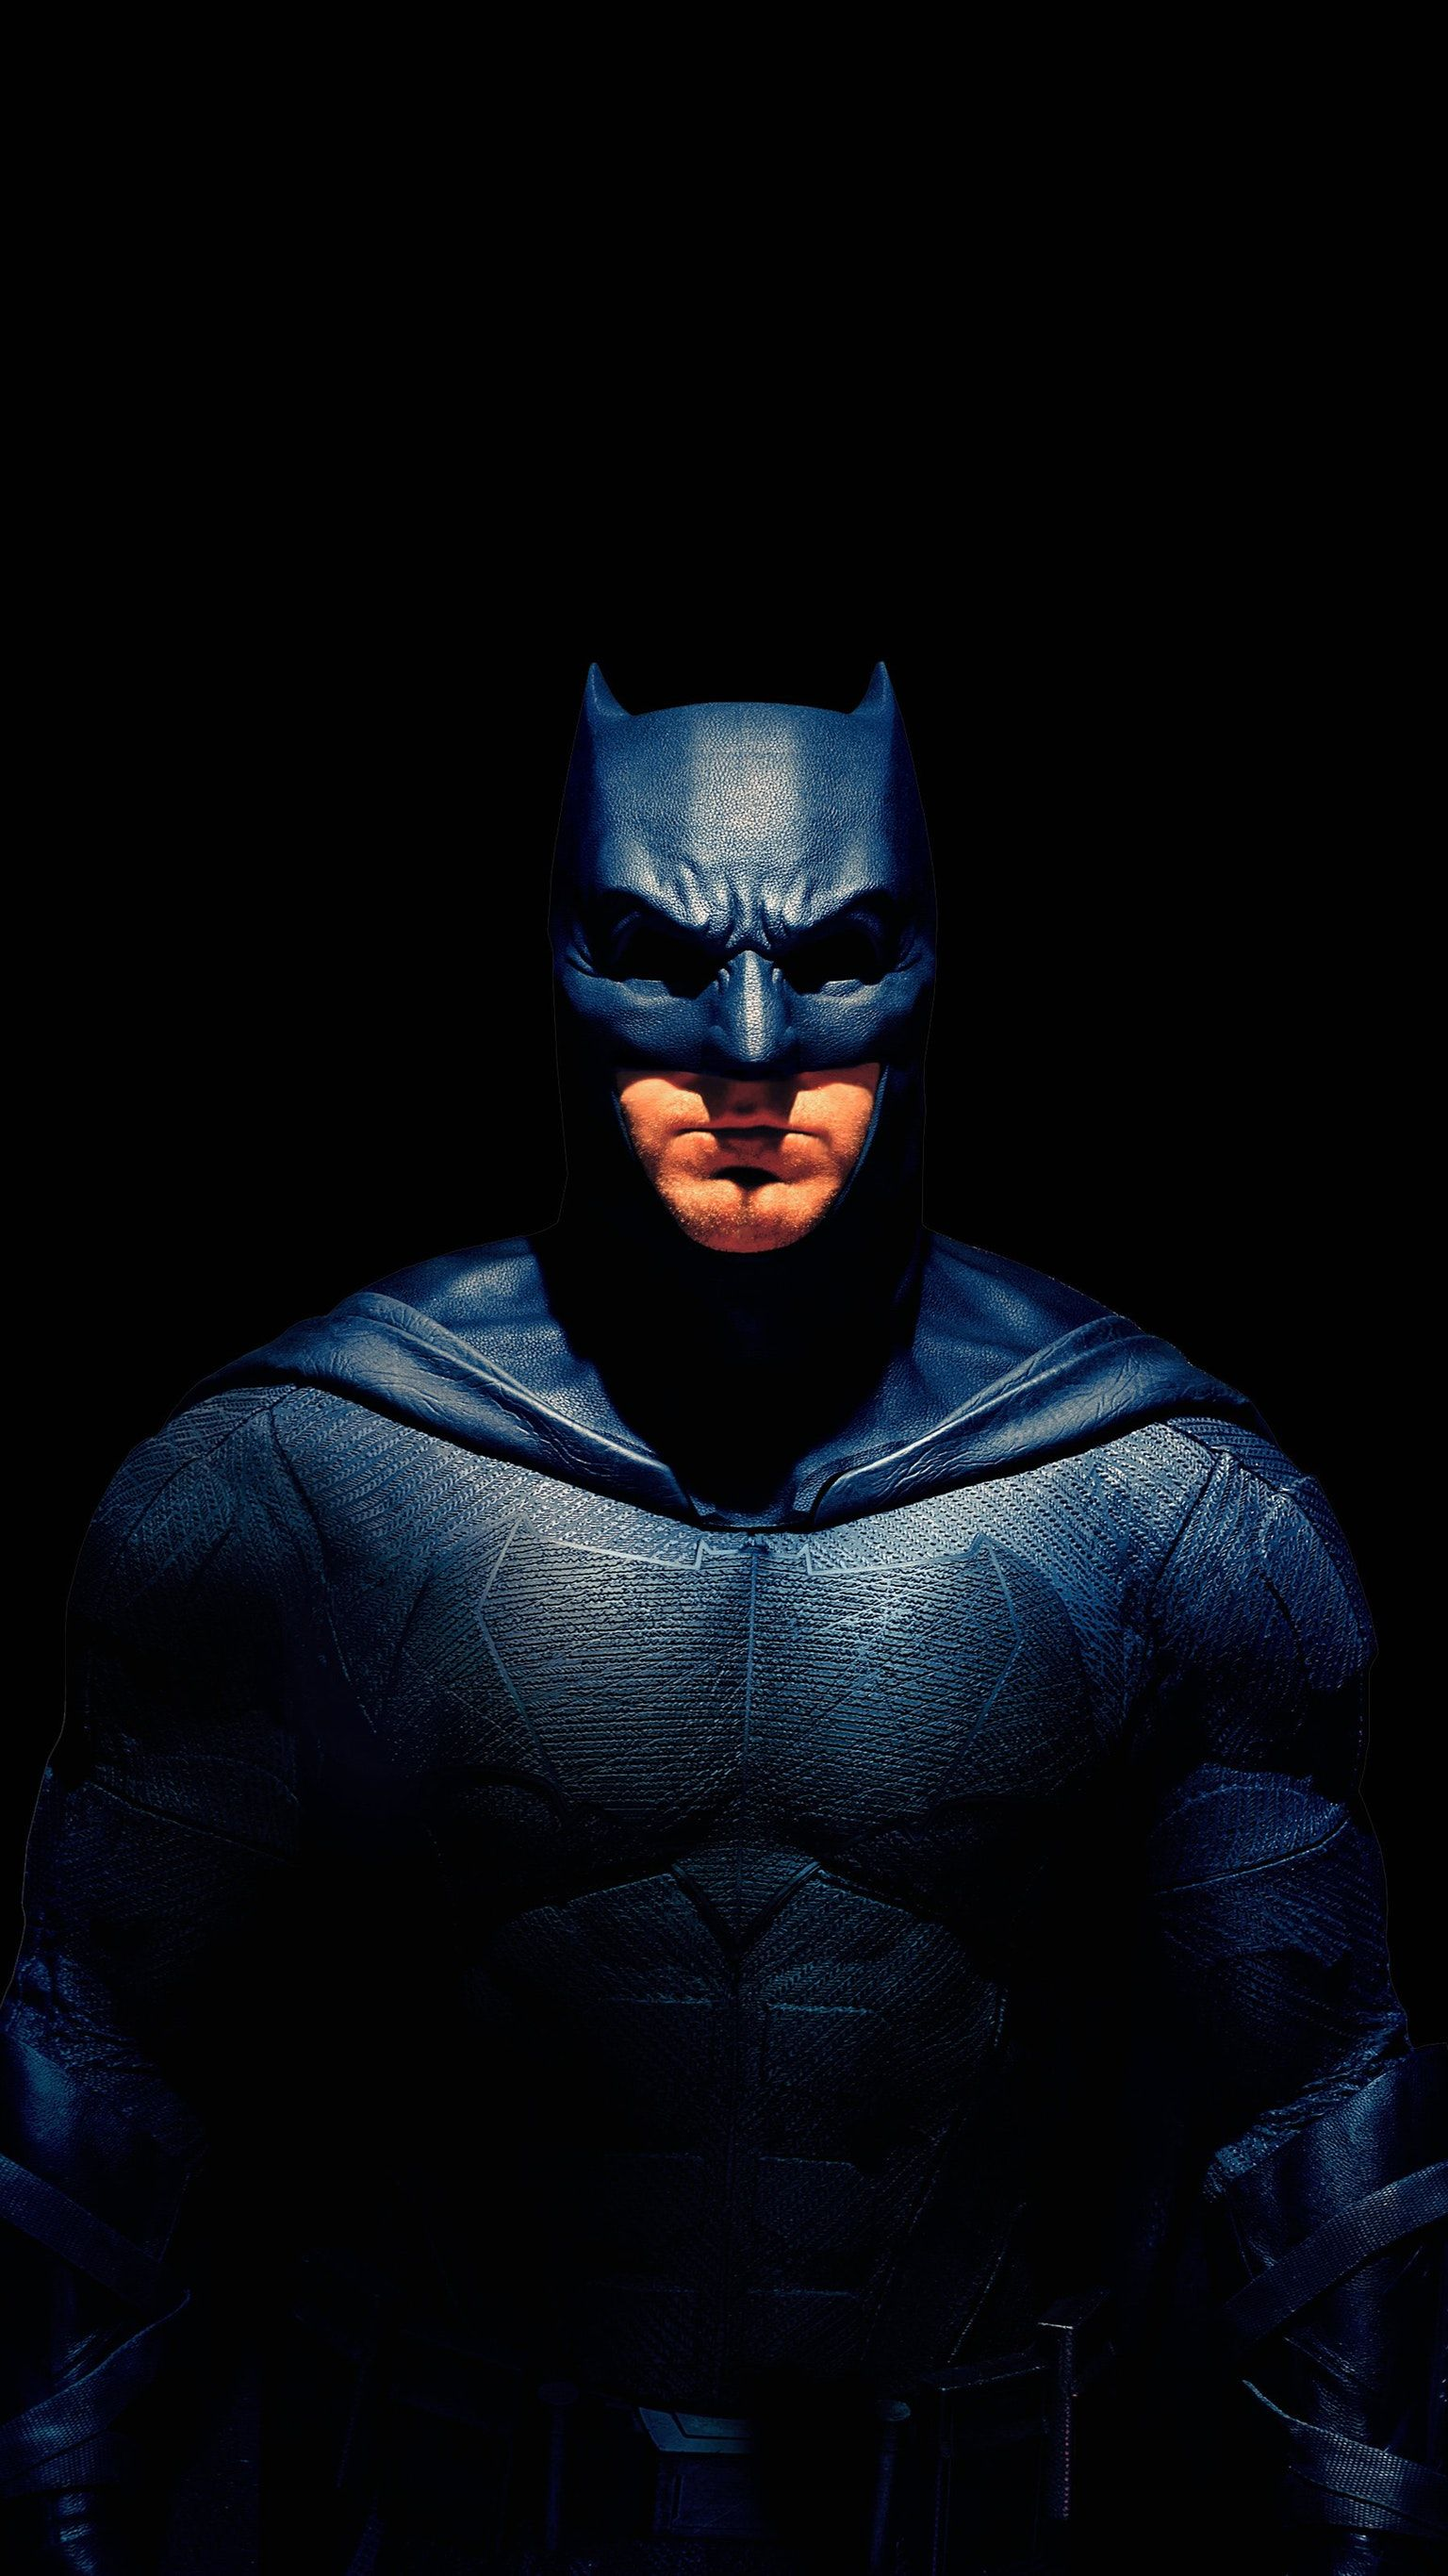 Justice League 2017 Phone Wallpaper Moviemania Justice League 2017 Batman Superhero Poster